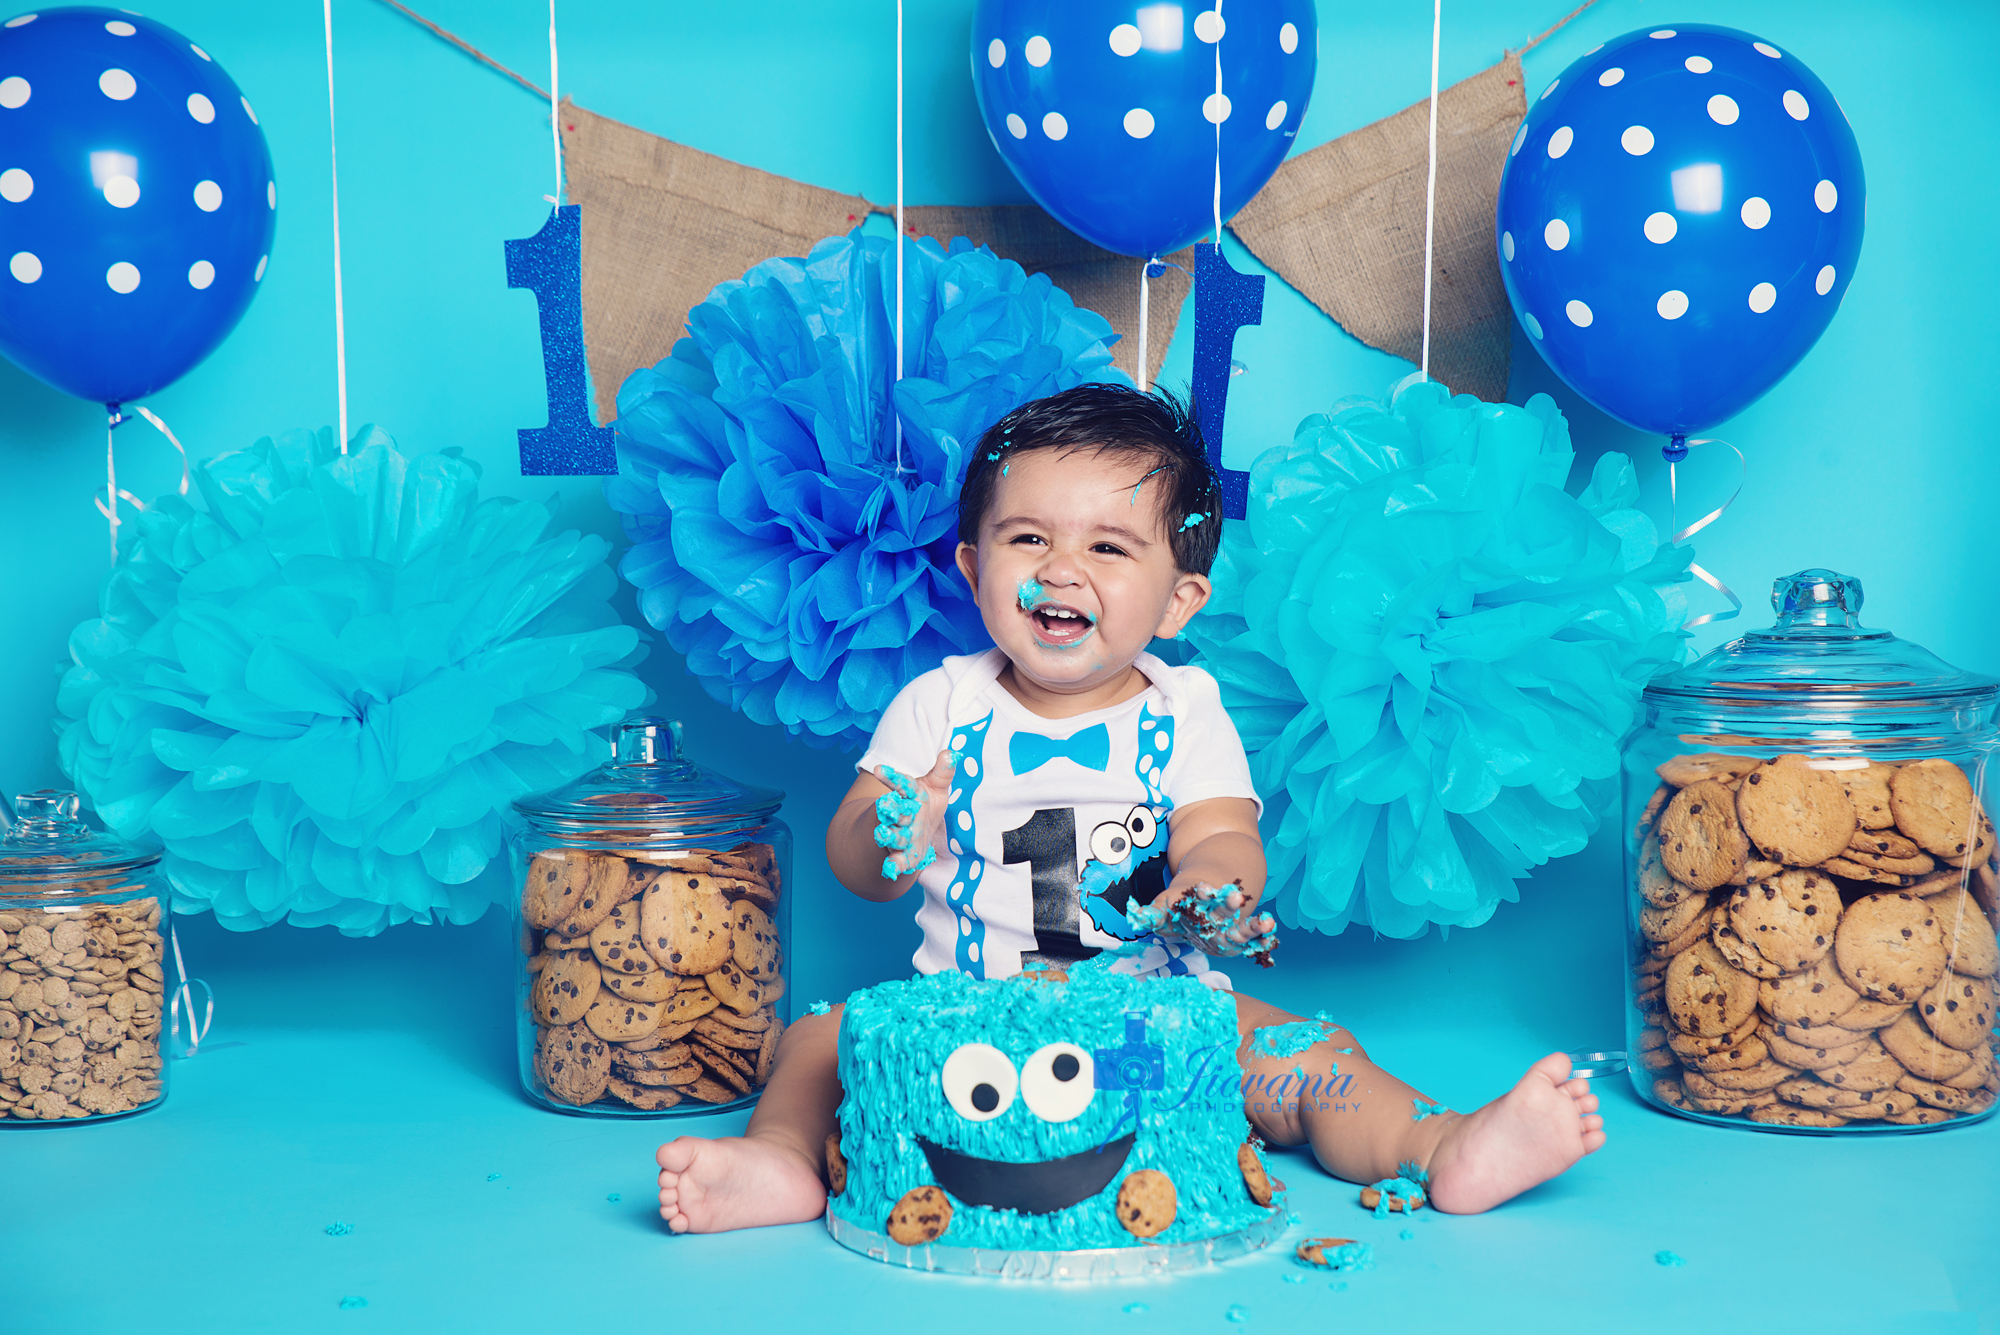 Abrahams 1st Birthday Smash Cake